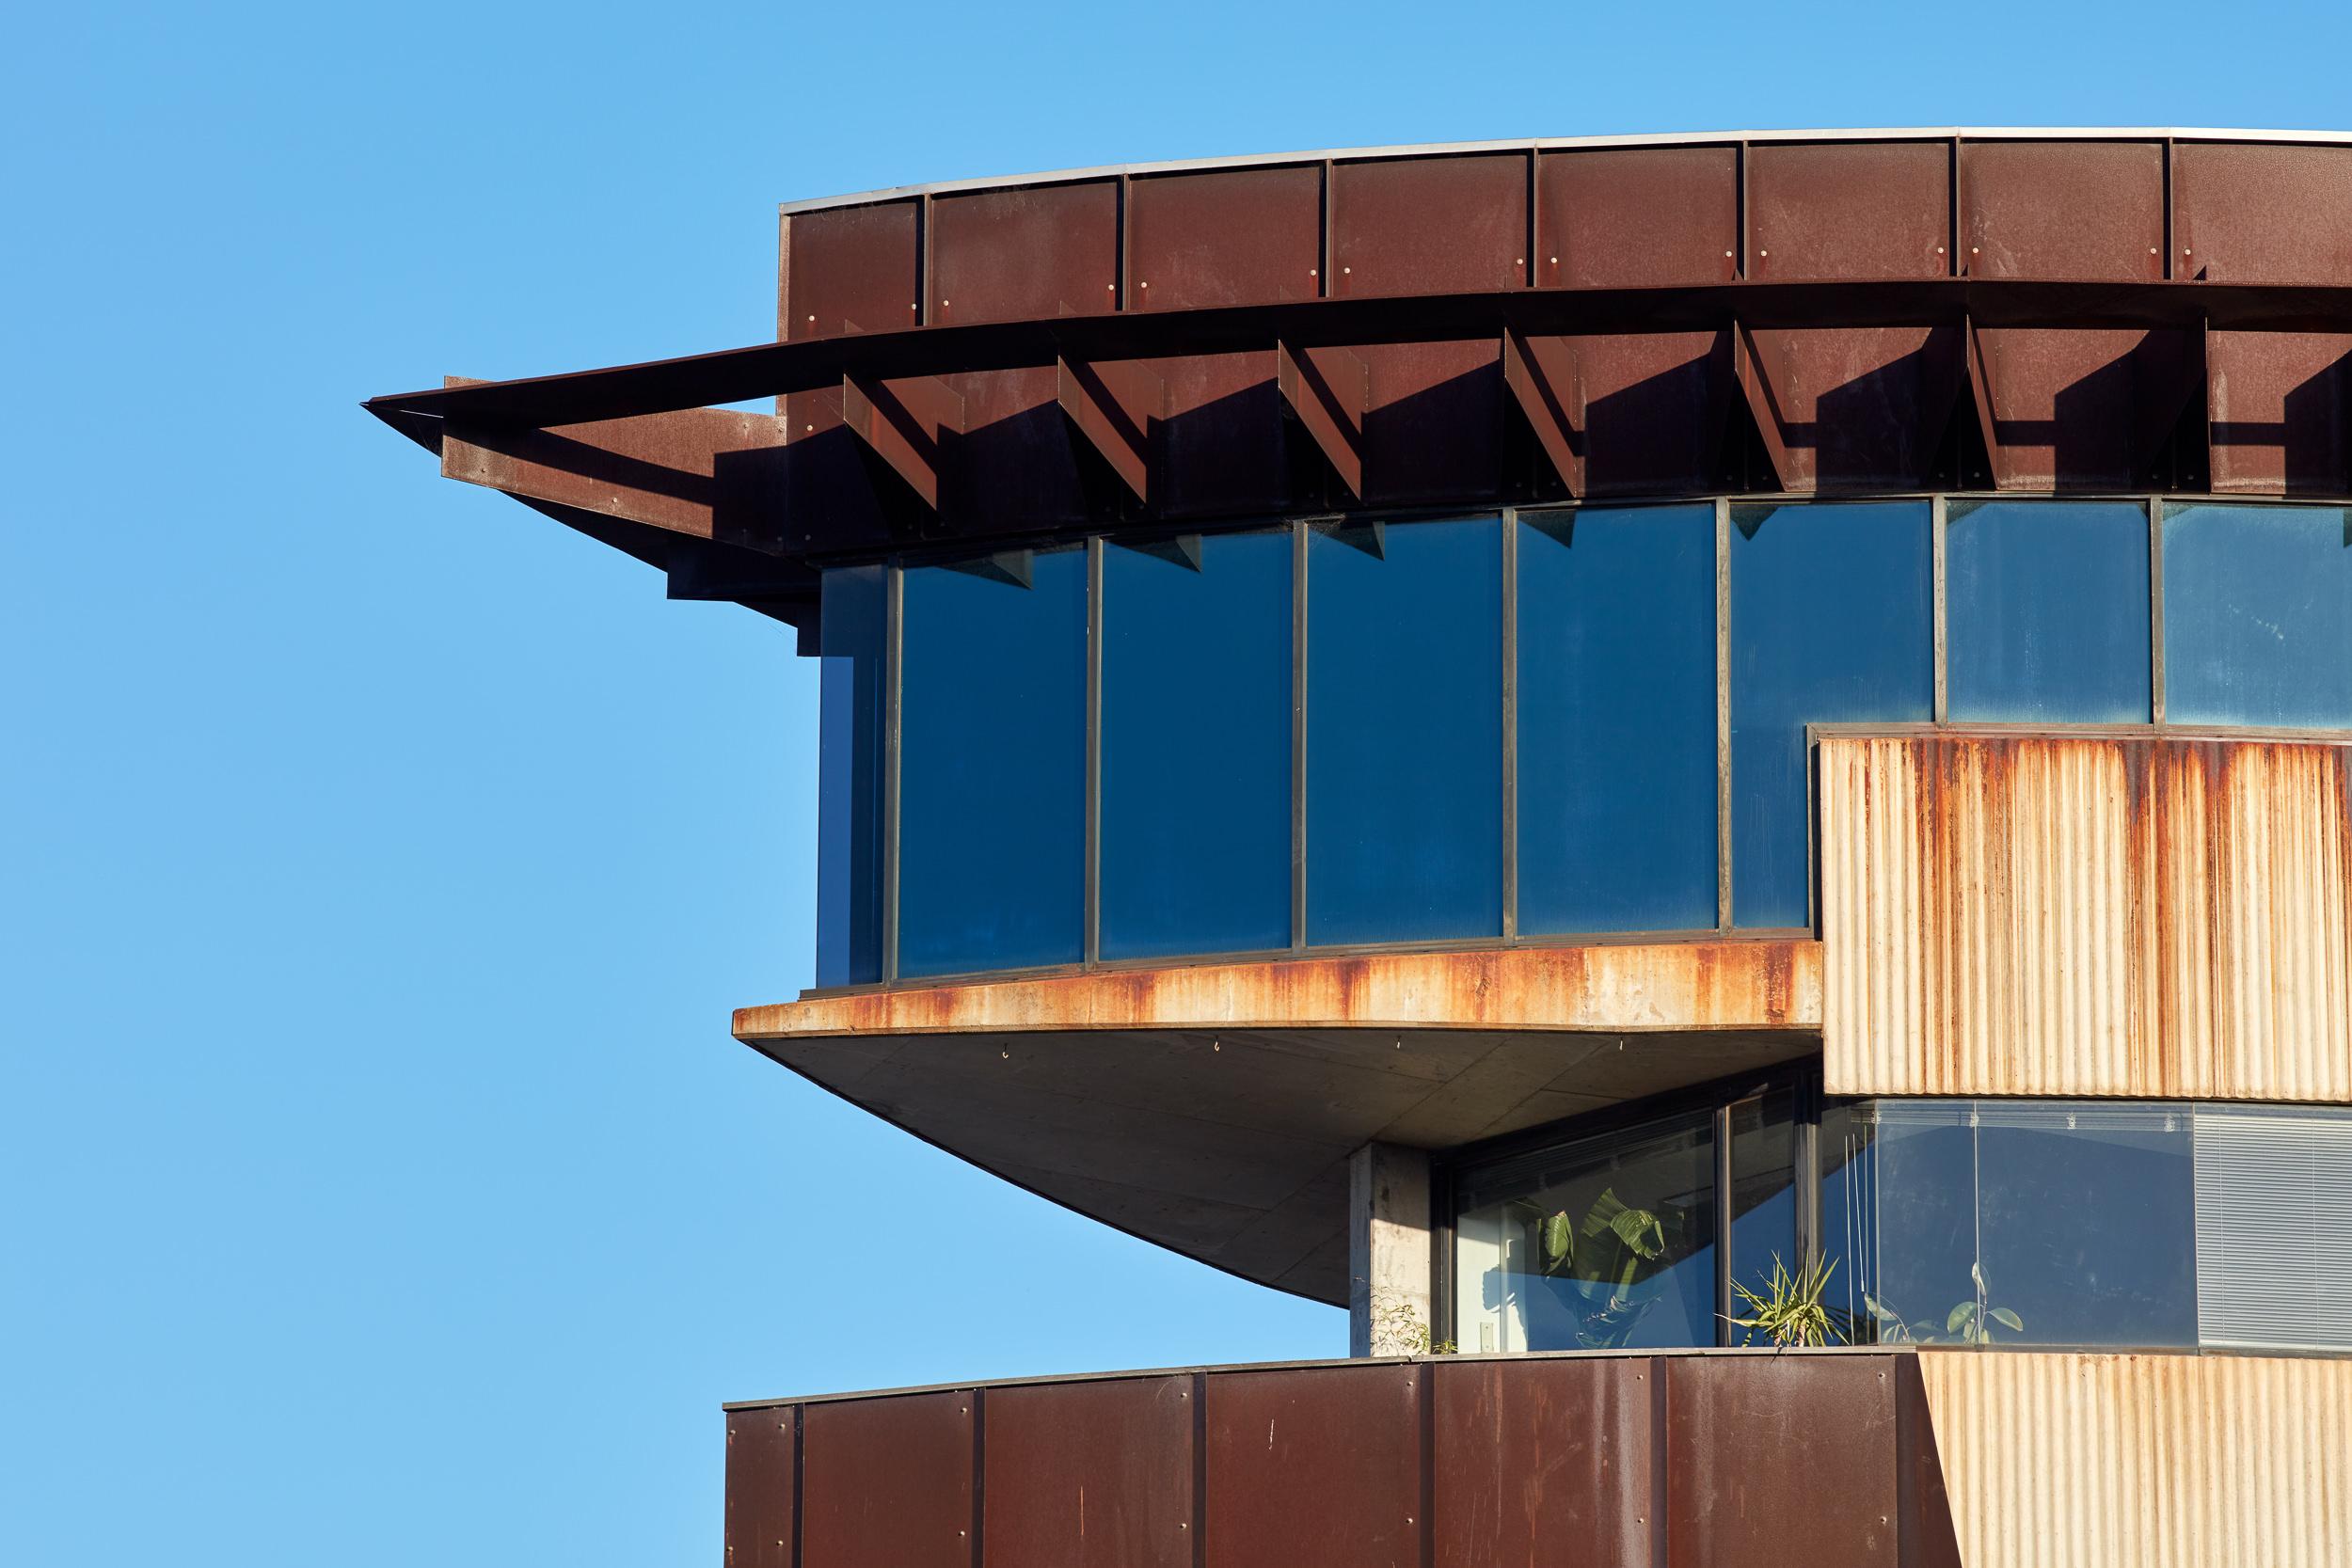 nathankdavis-nathan-k-davis-1nkd-architecture-architectural-photography-interior-exterior-design-real-estate-richmond-abinger-st-street-melbourne-8